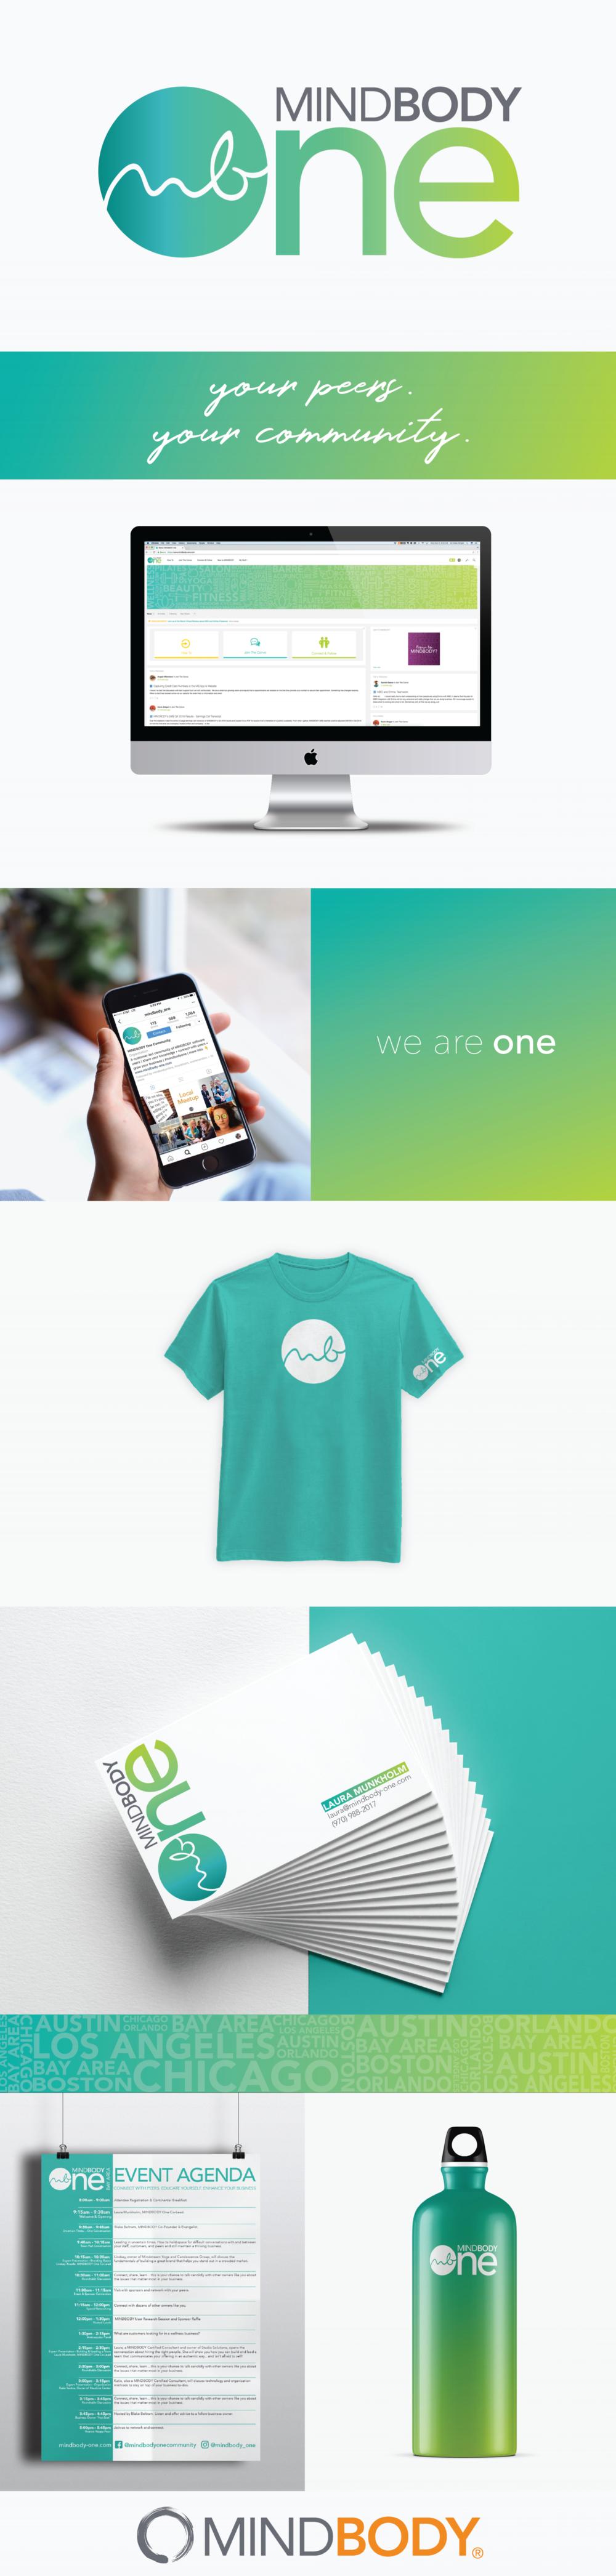 MINDBODY One Branding Designed by Amari Creative.png